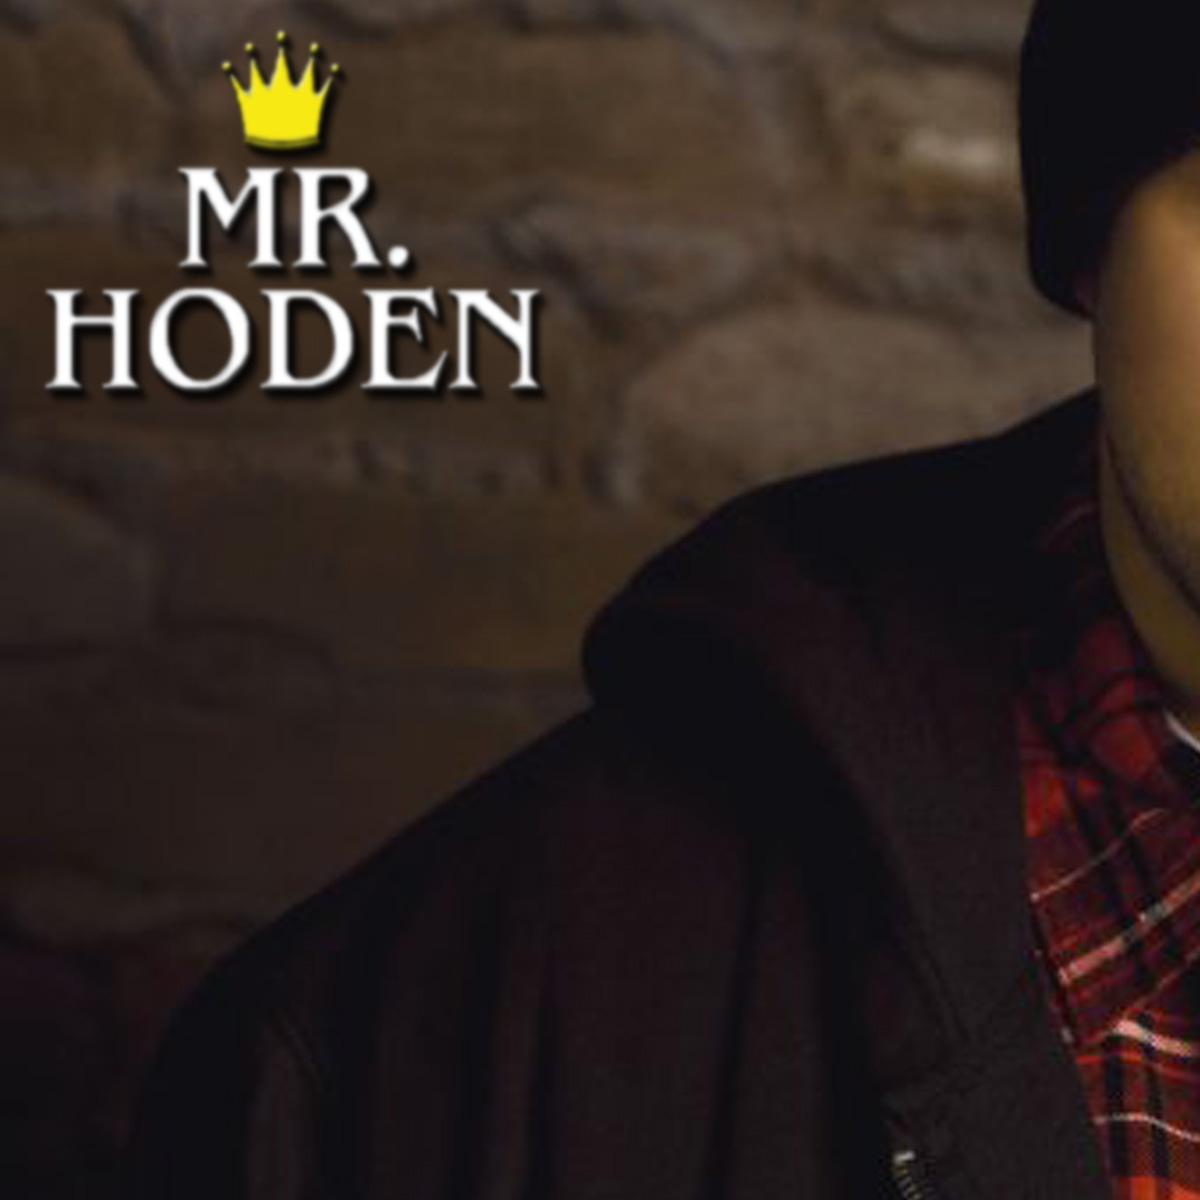 Upcoming: Mr. Hoden - NECRO TYPE BEAT BOOM BAP BEAT 2021 [FREE BEAT]